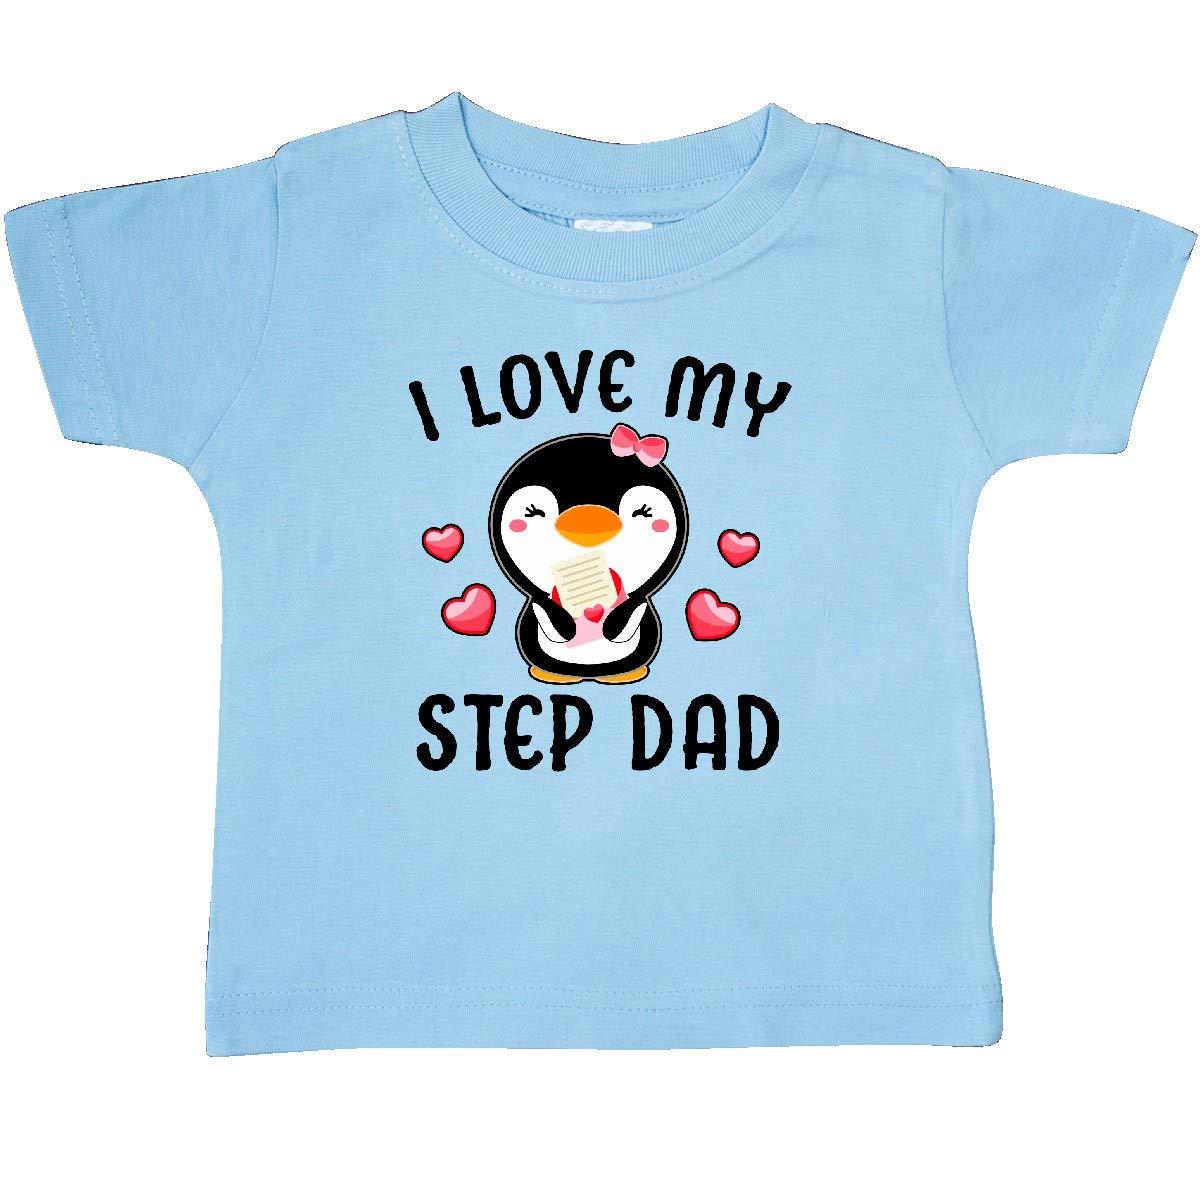 DAVIDLLOYD Stray Cats Unisex-Baby Newborn Long-Sleeve Cotton Comfortable Infant Romper Black